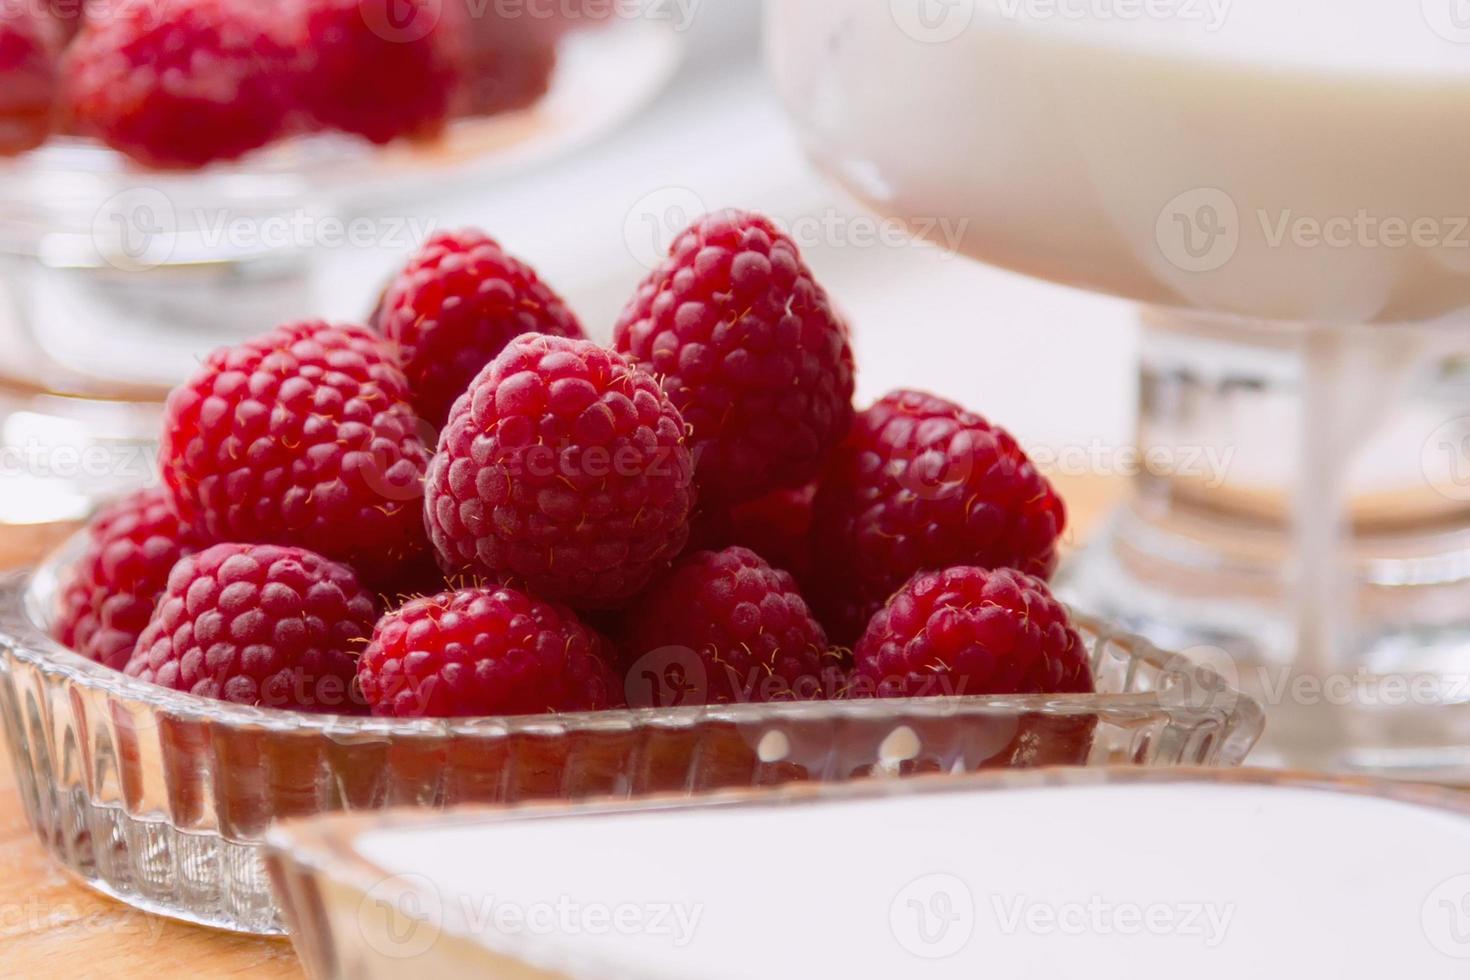 ingrediënten: frambozen, melk, room foto